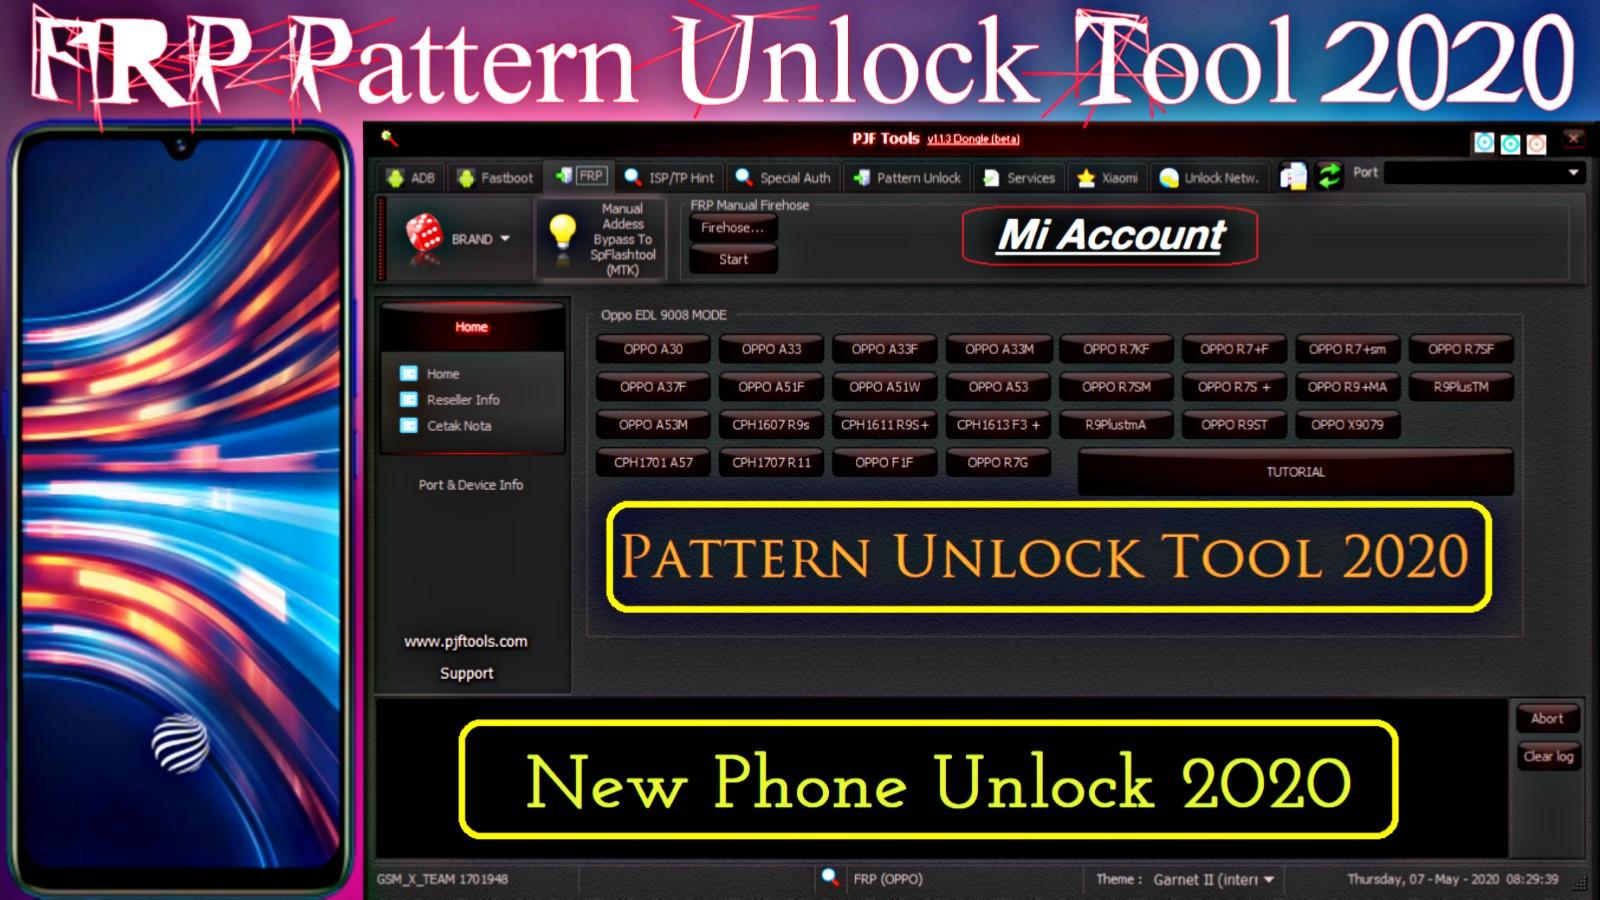 All In One Pattern Unlock Tool 2020 | Oppo, Vivo, samsung, Mi, Huawei, | FRP, Mi Account